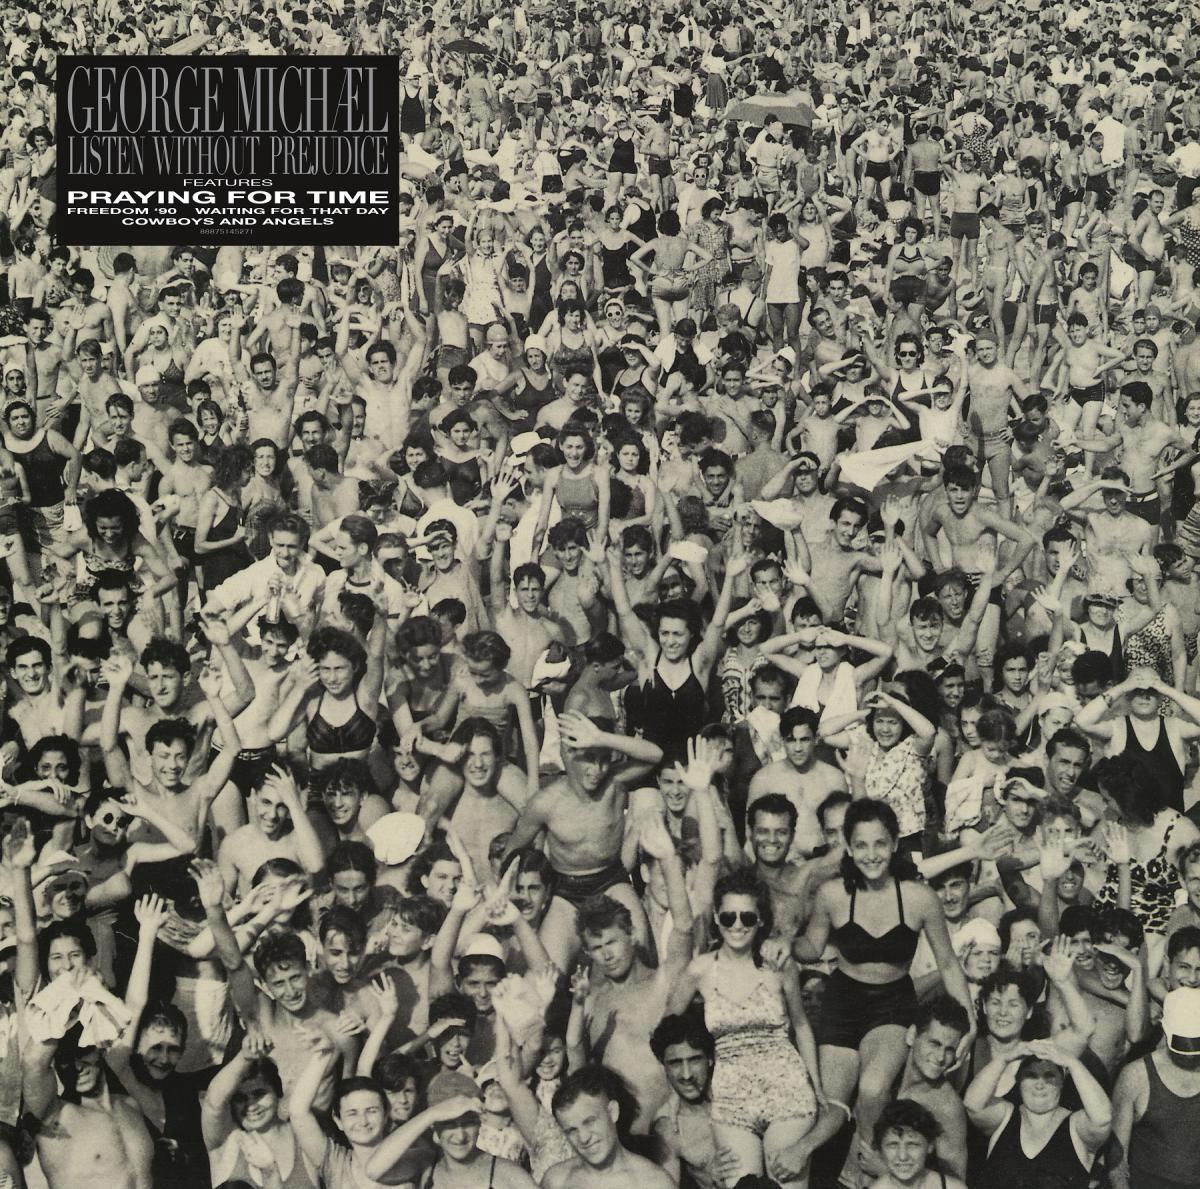 George Michael, Albumcover, Listen Withput Prejudice Vol.1